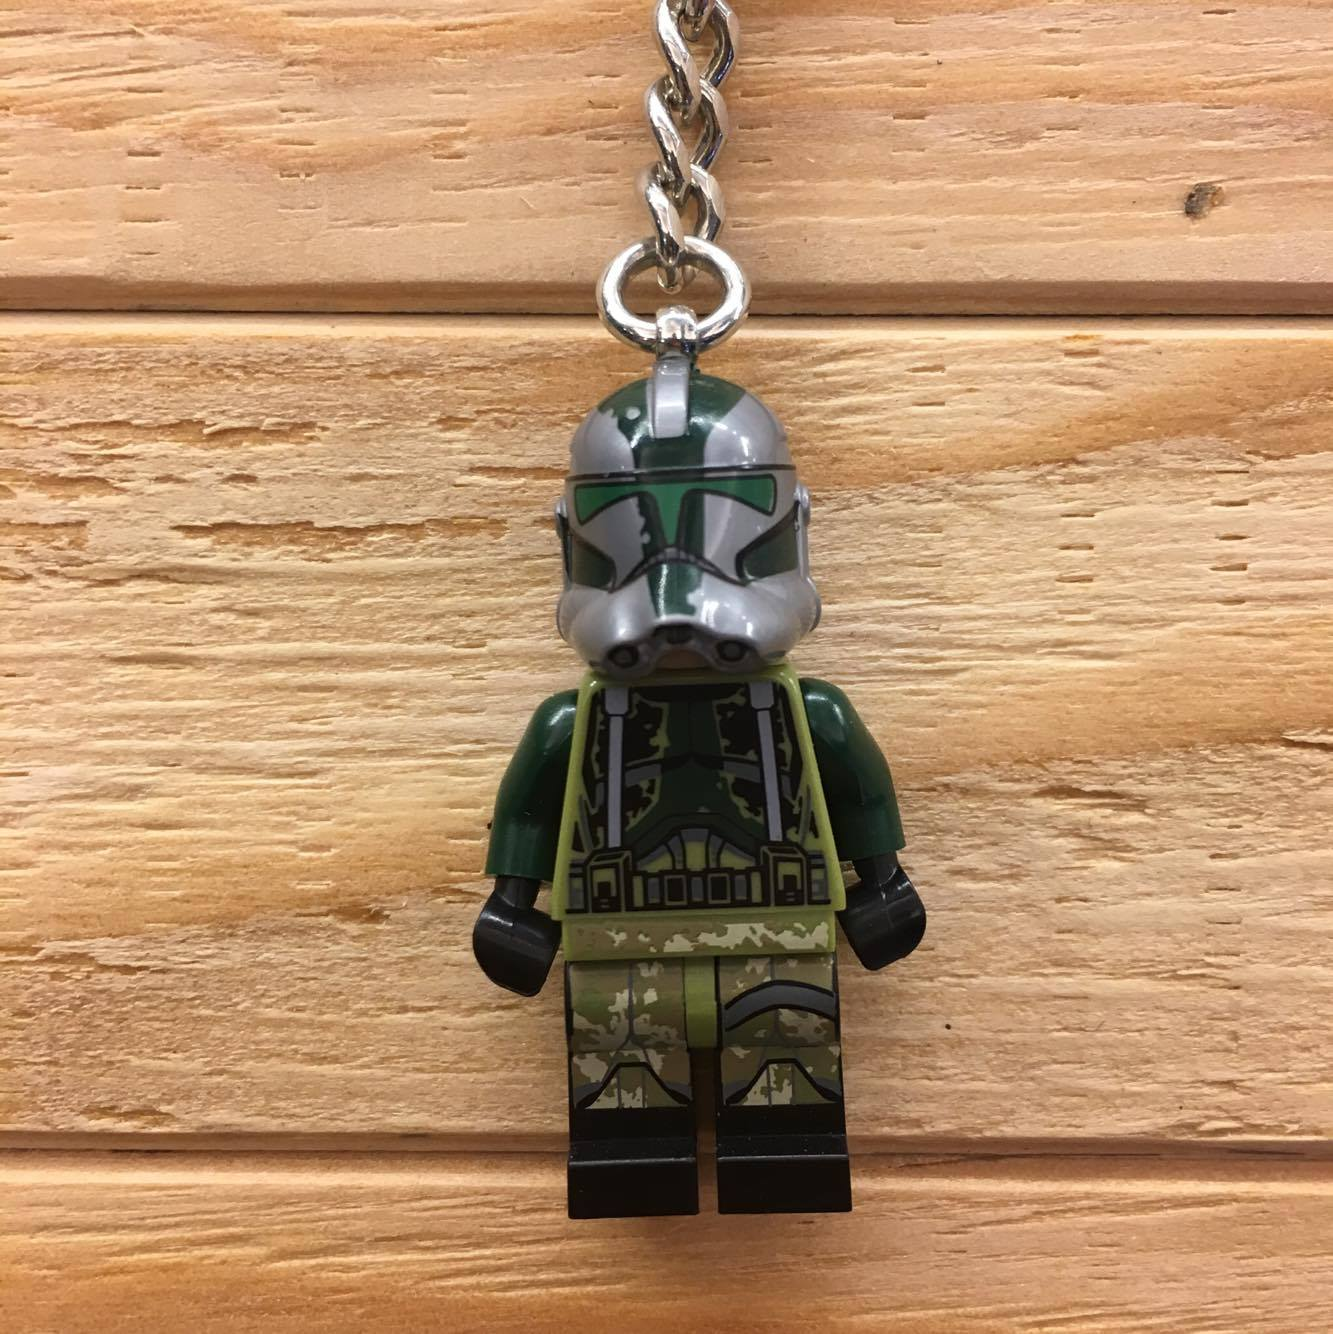 BEETLE LEGO STAR WARS COMMDER GREE 星際大戰 指揮官 葛里 樂高 積木 鑰匙圈 玩具